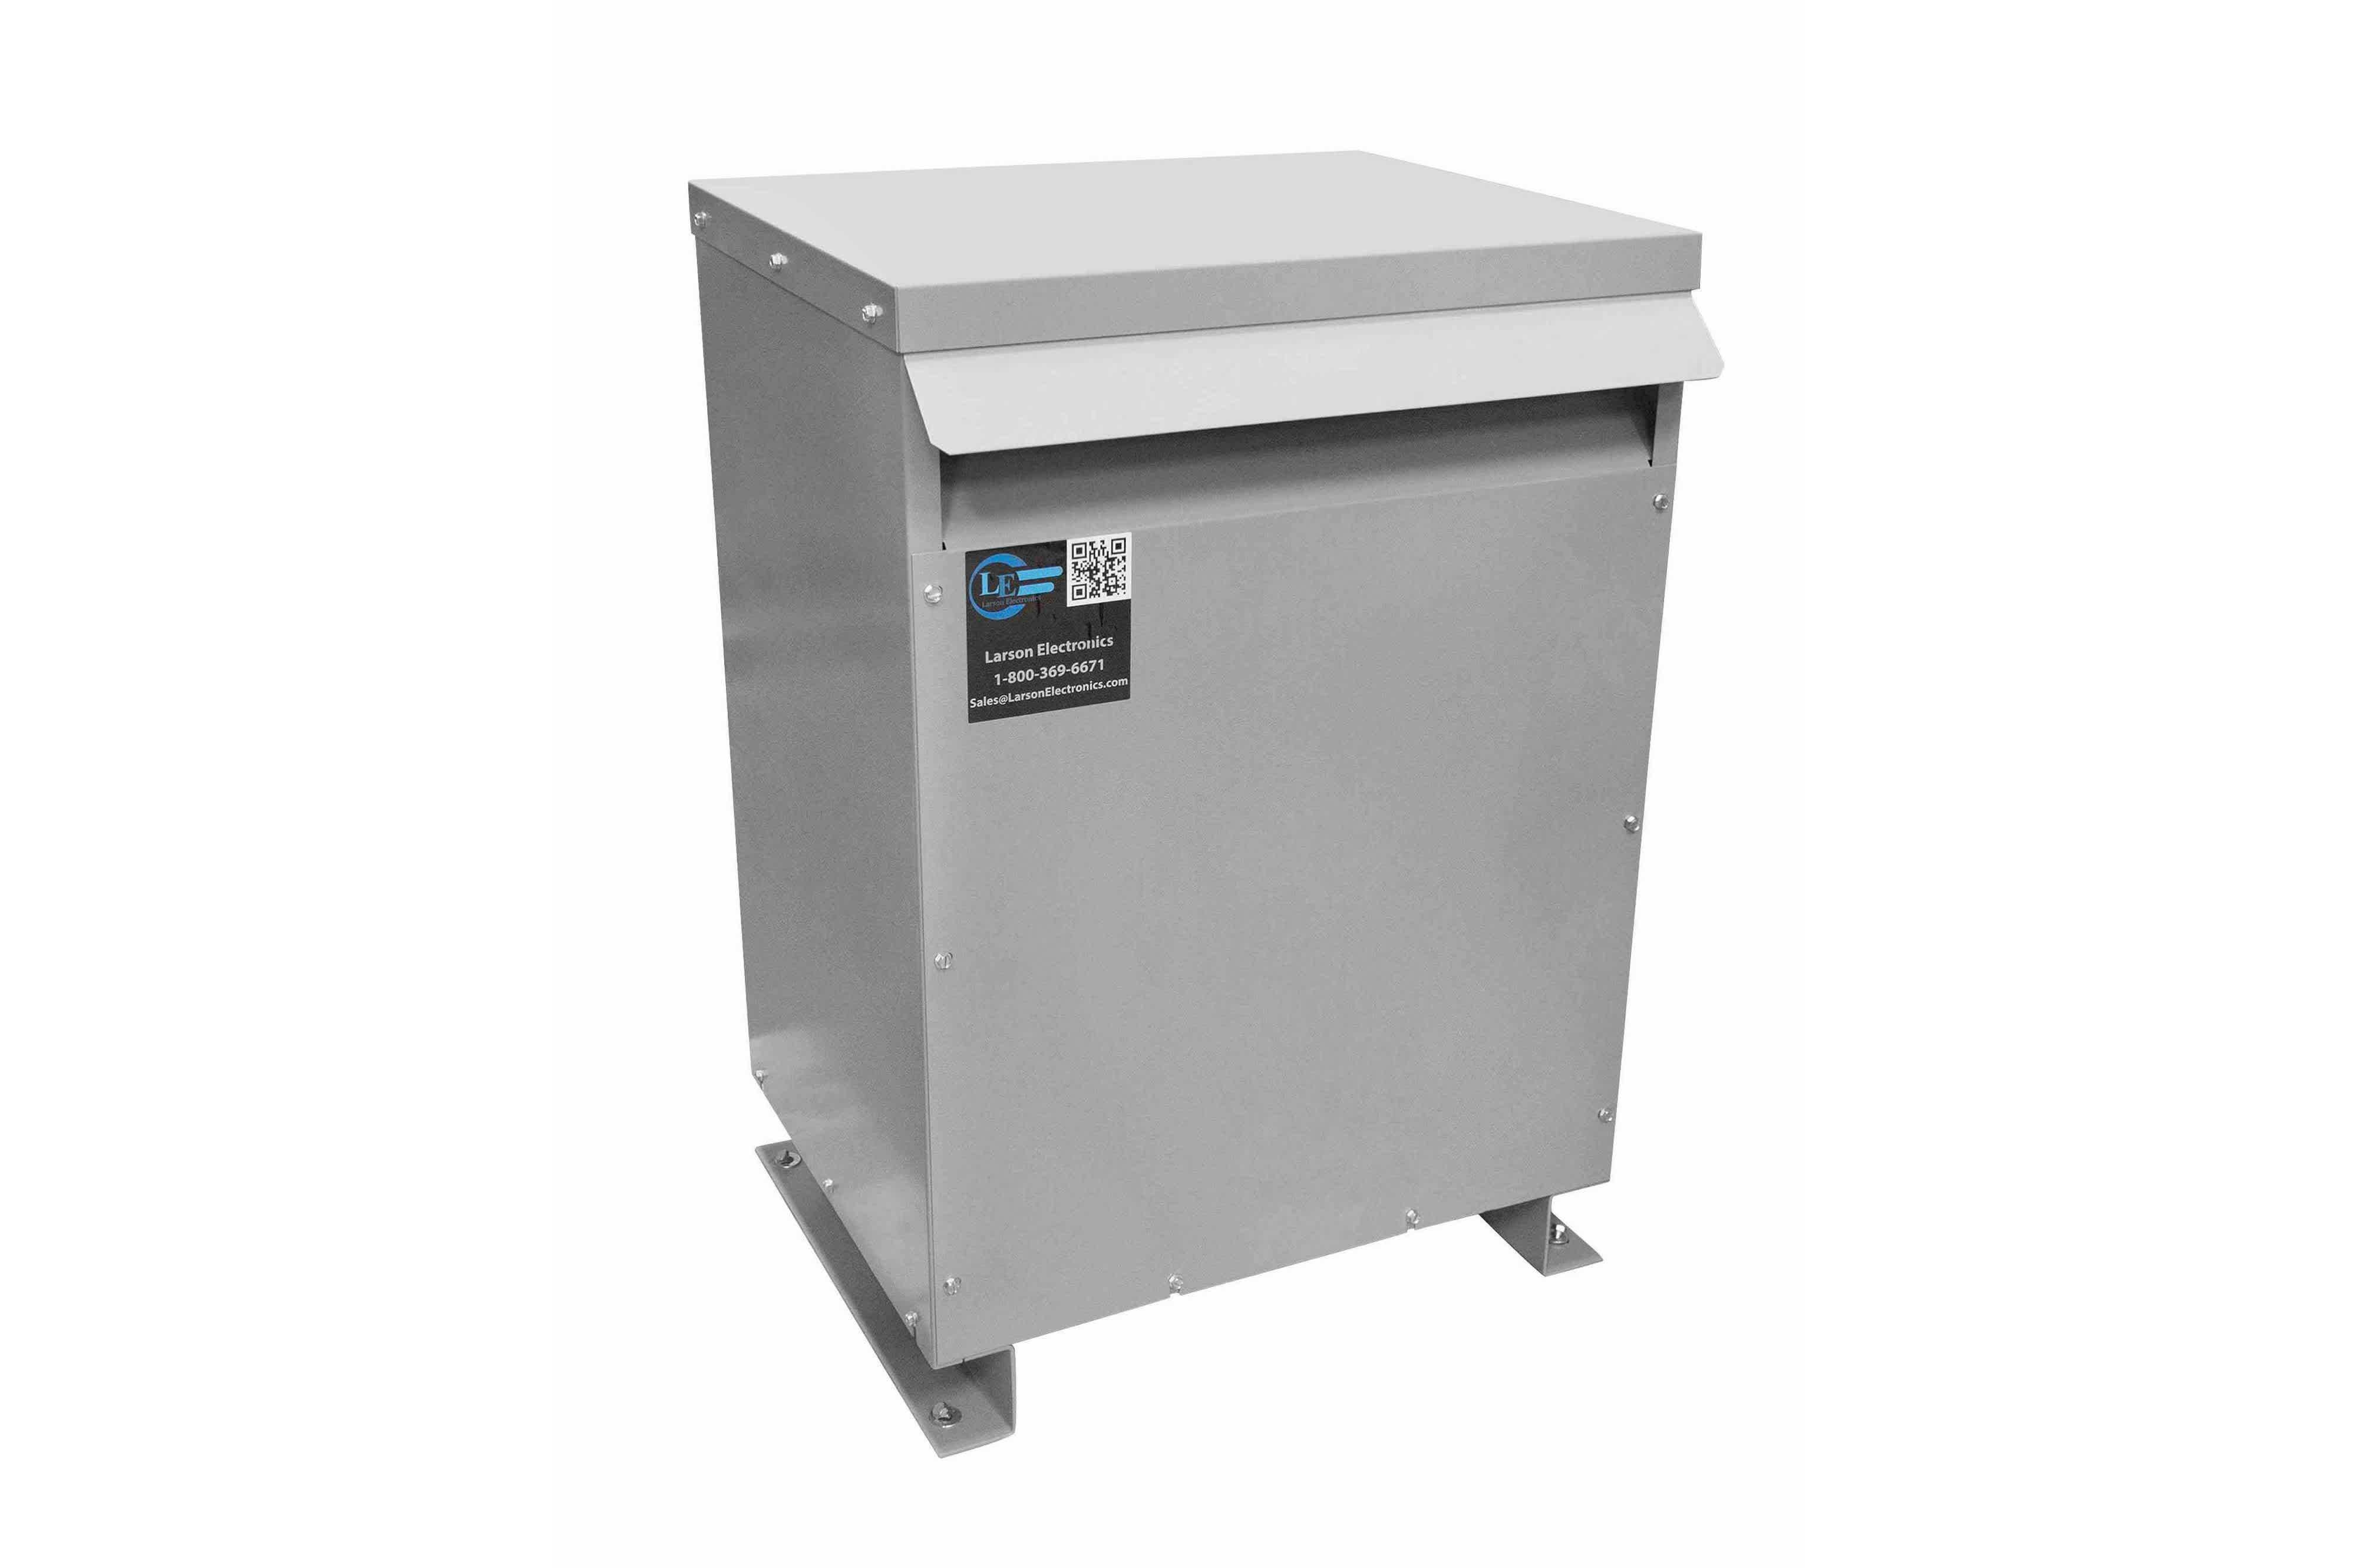 35 kVA 3PH Isolation Transformer, 460V Wye Primary, 380Y/220 Wye-N Secondary, N3R, Ventilated, 60 Hz